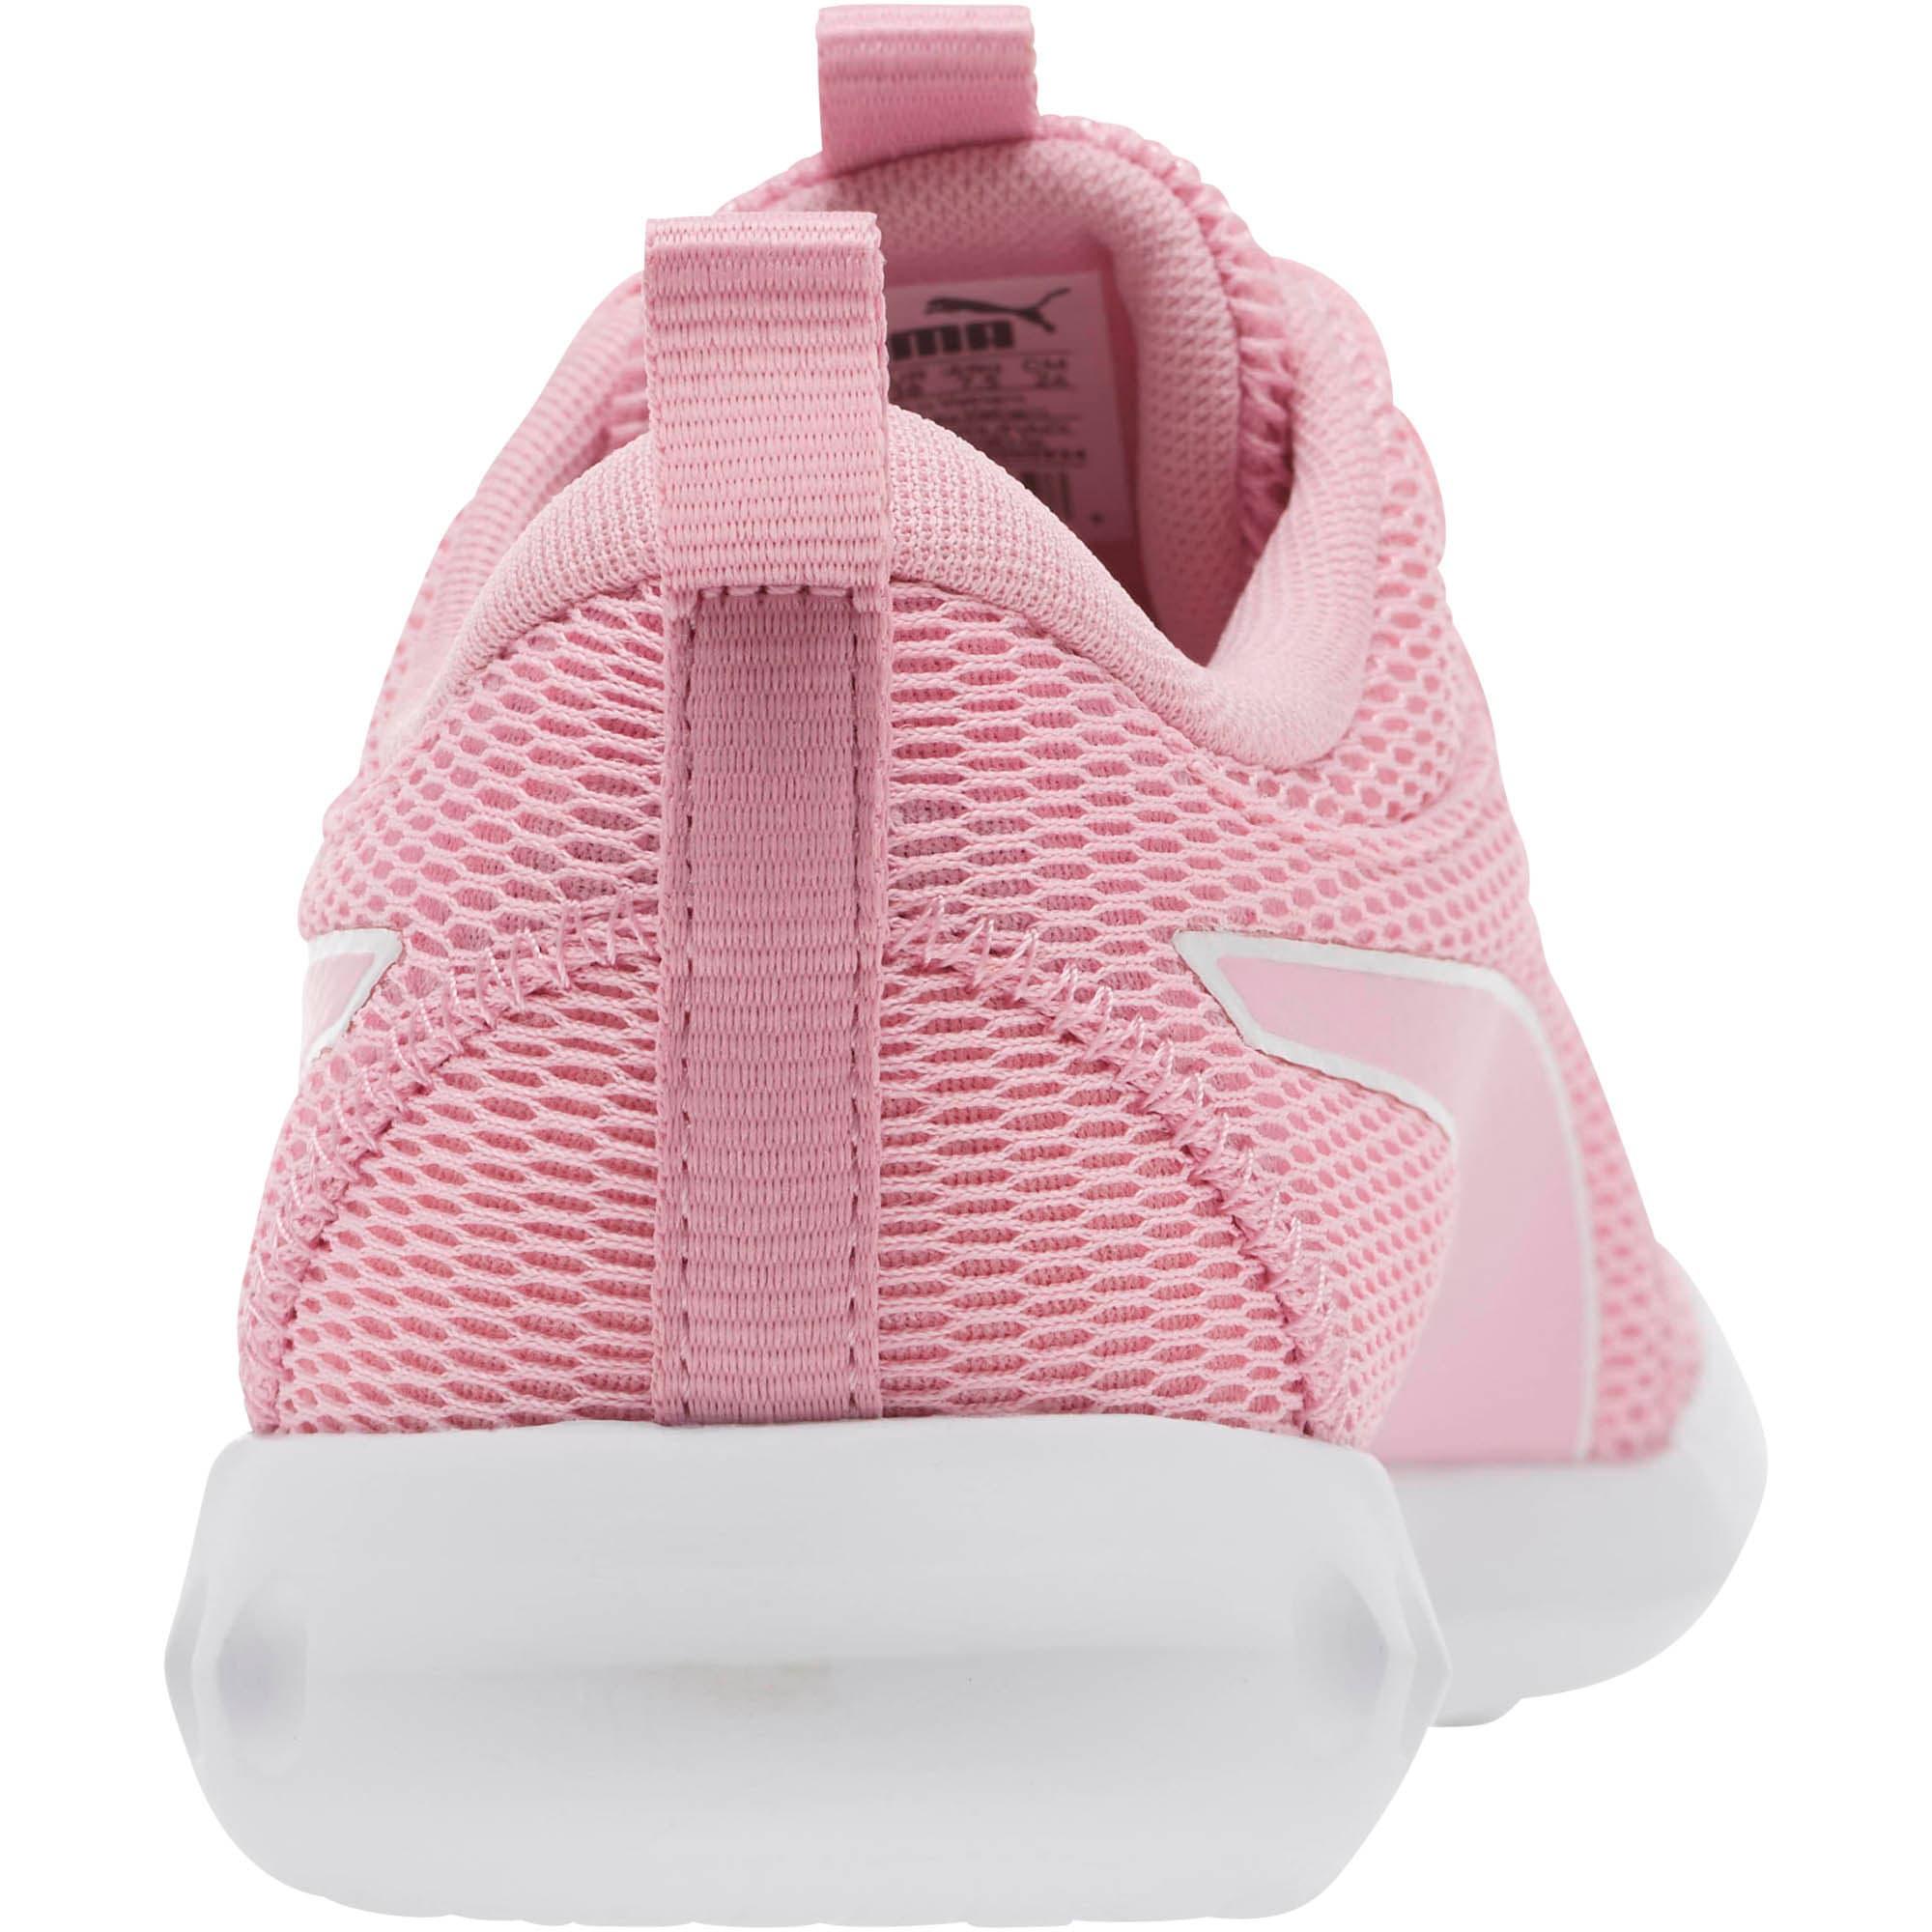 Thumbnail 4 of Carson 2 New Core Women's Training Shoes, Pale Pink-Puma White, medium